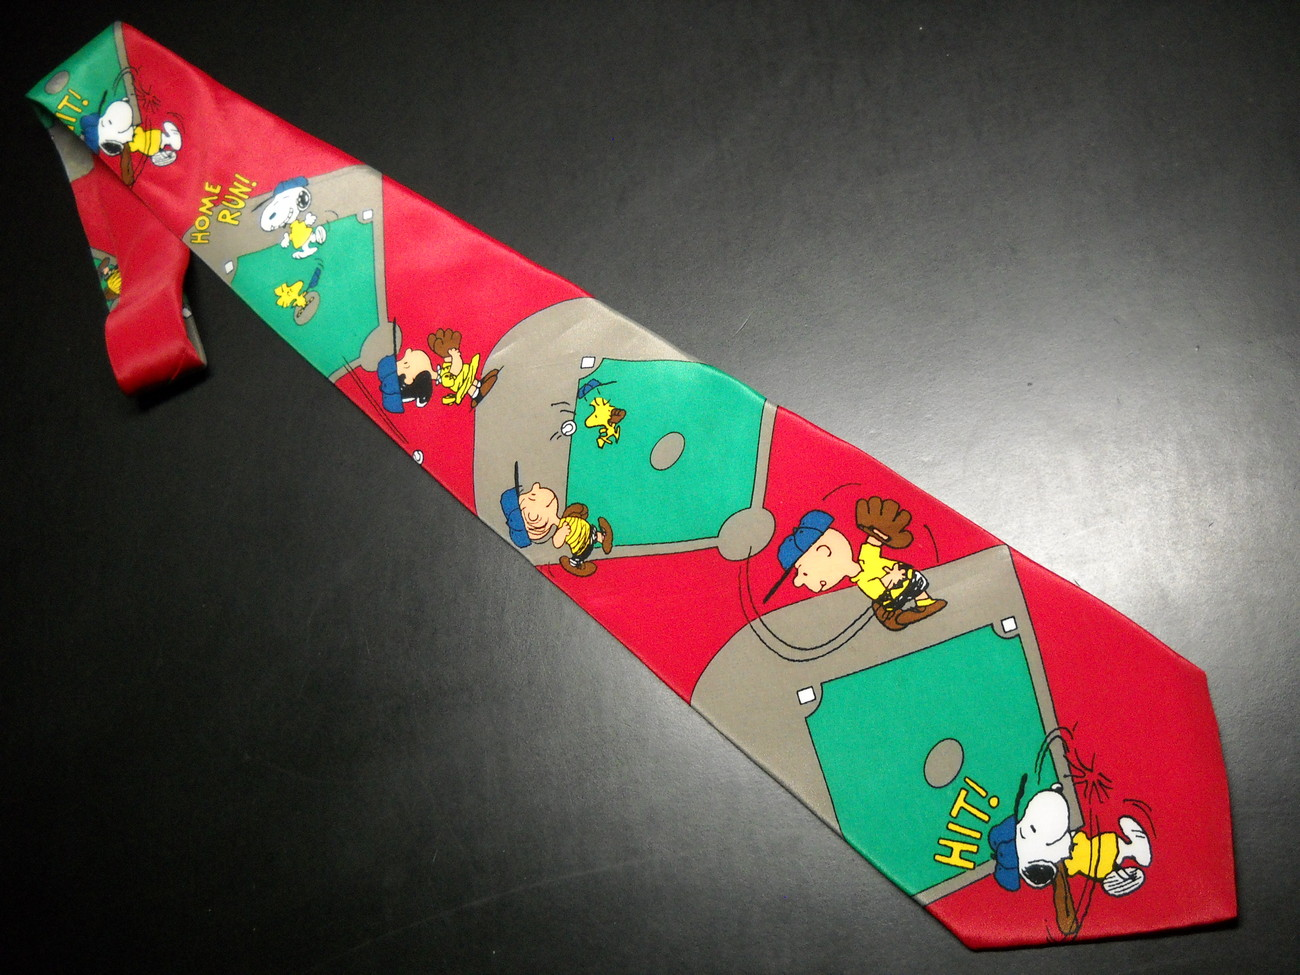 Peanuts Charlie Brown and Gang Neck Tie I Wanna Win Baseball Red Green Ballfield